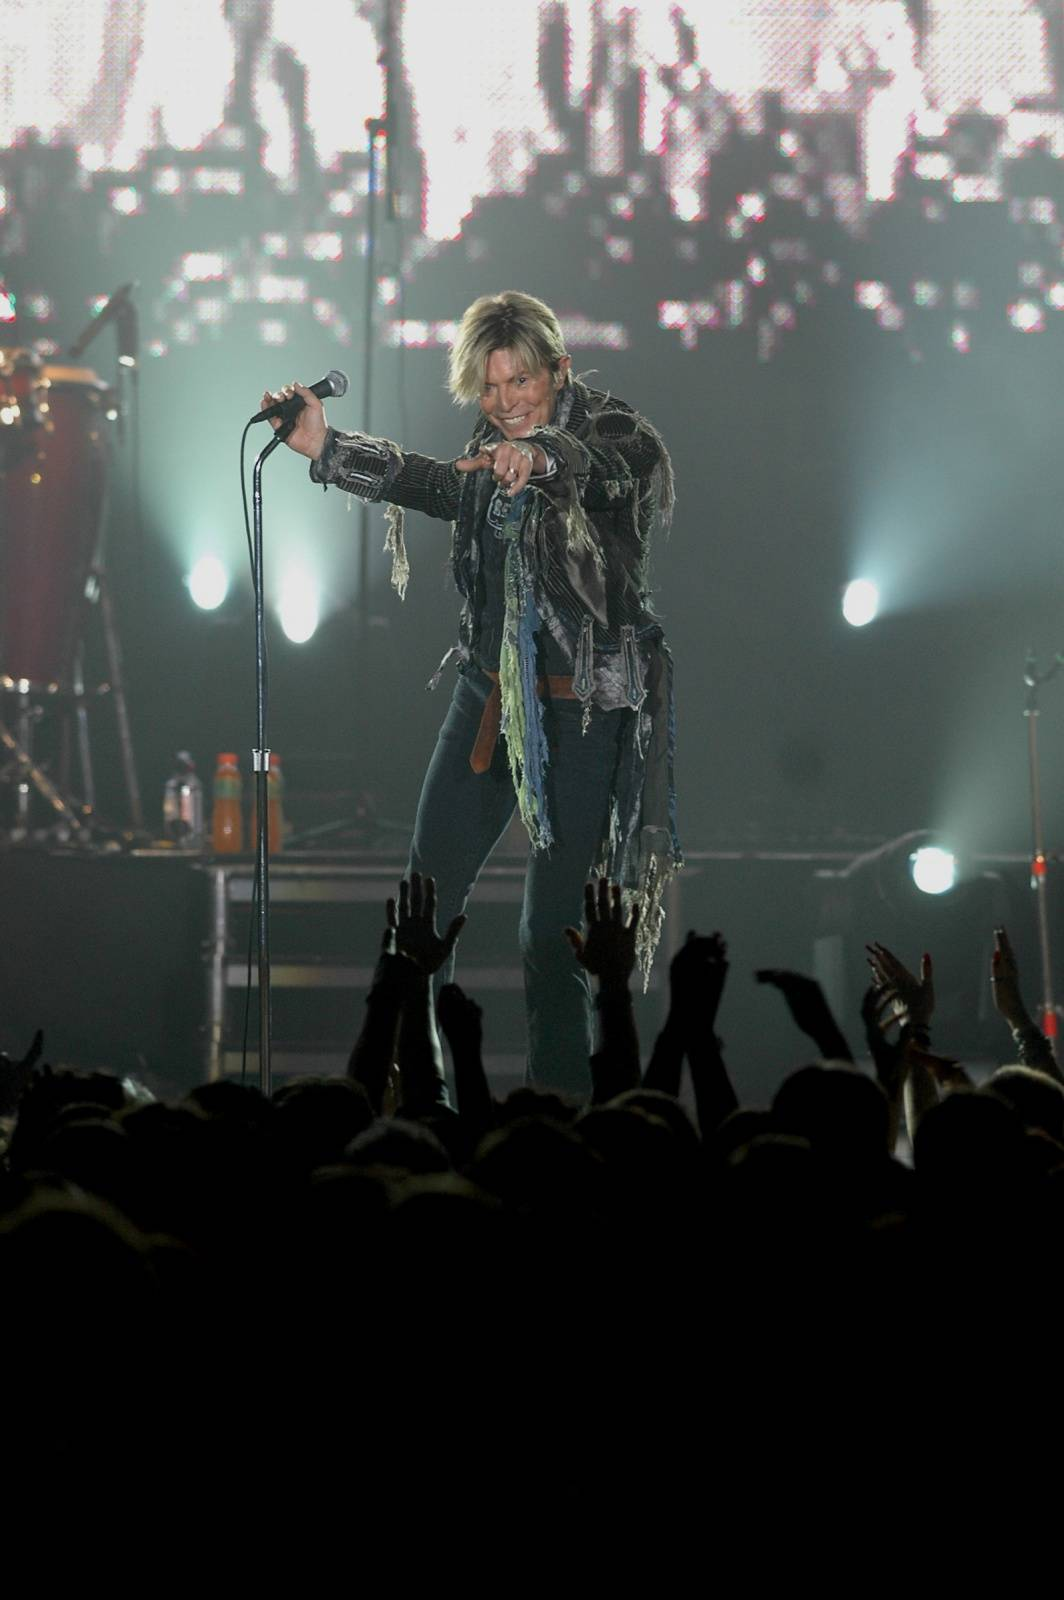 RETRO: Svou poslední pražskou show v roce 2004 David Bowie nedohrál